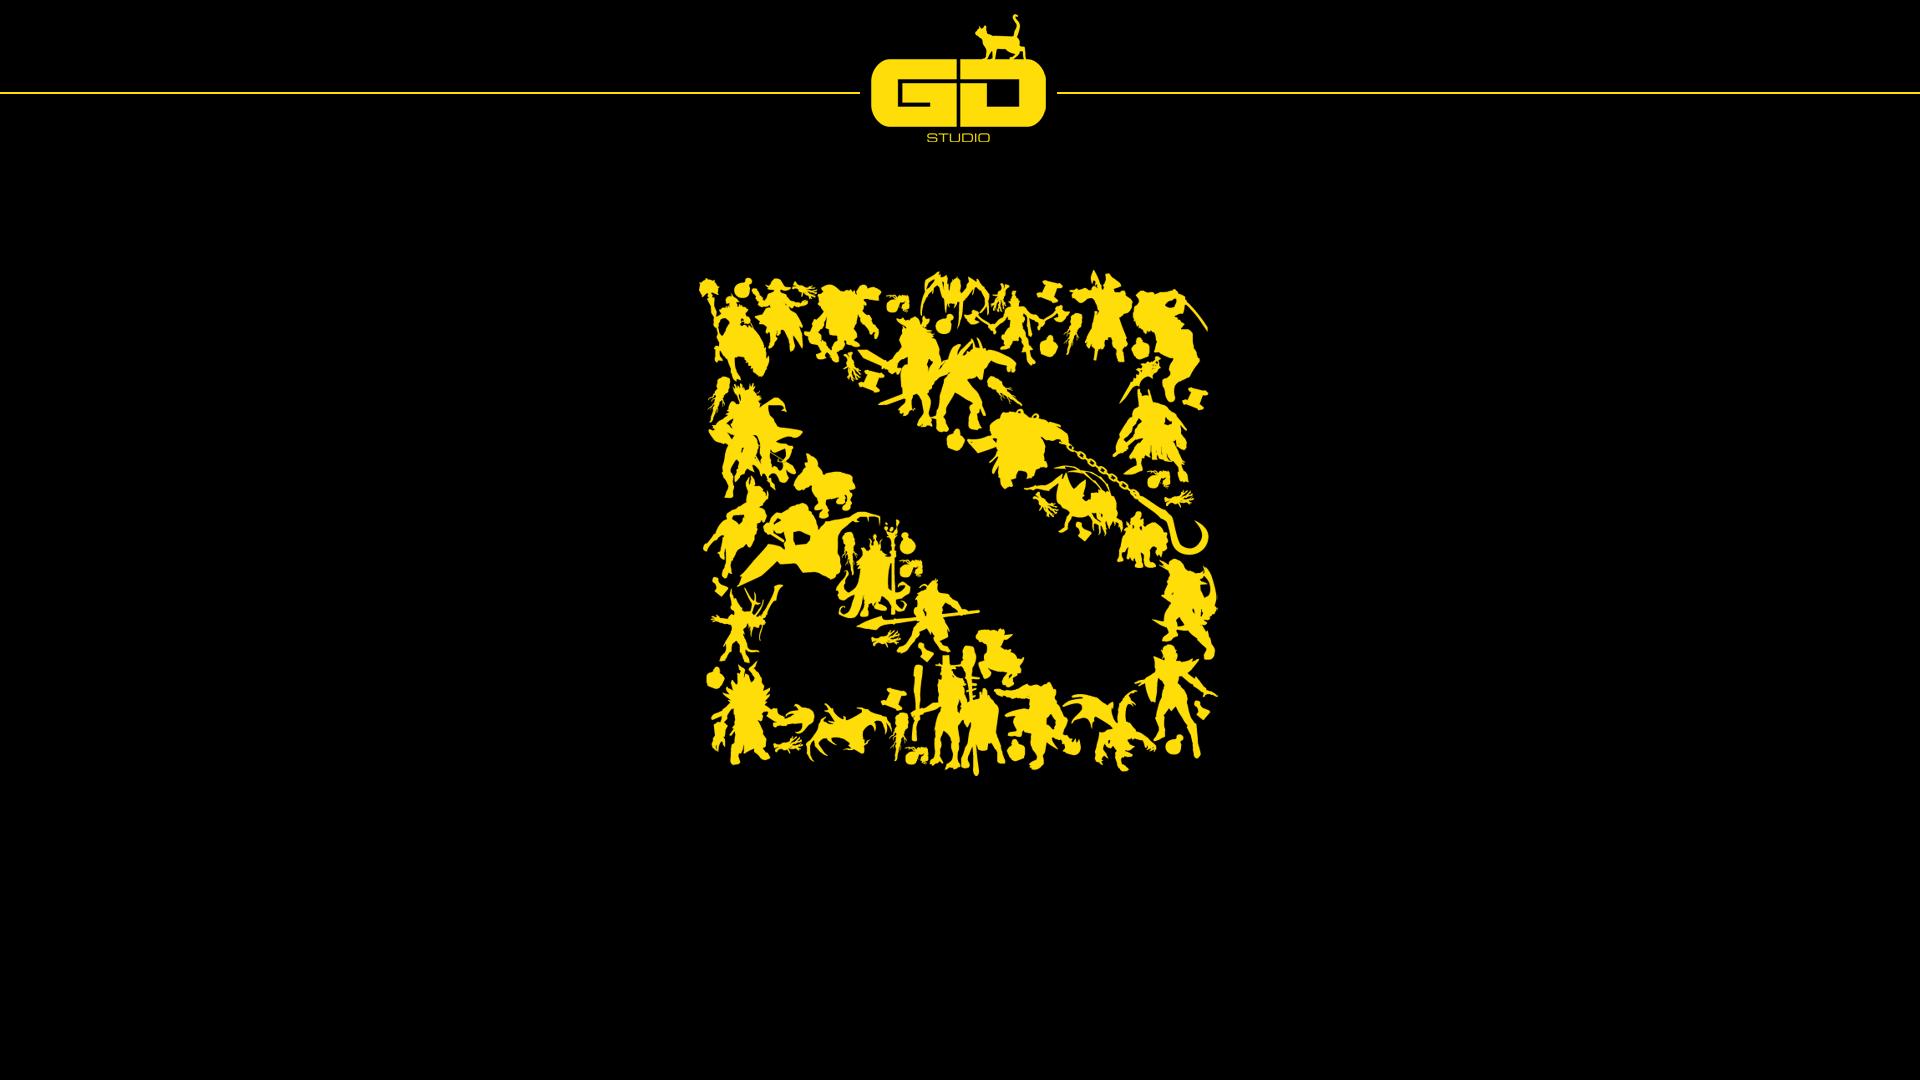 Dota 2 silhouette logo wallpaper..